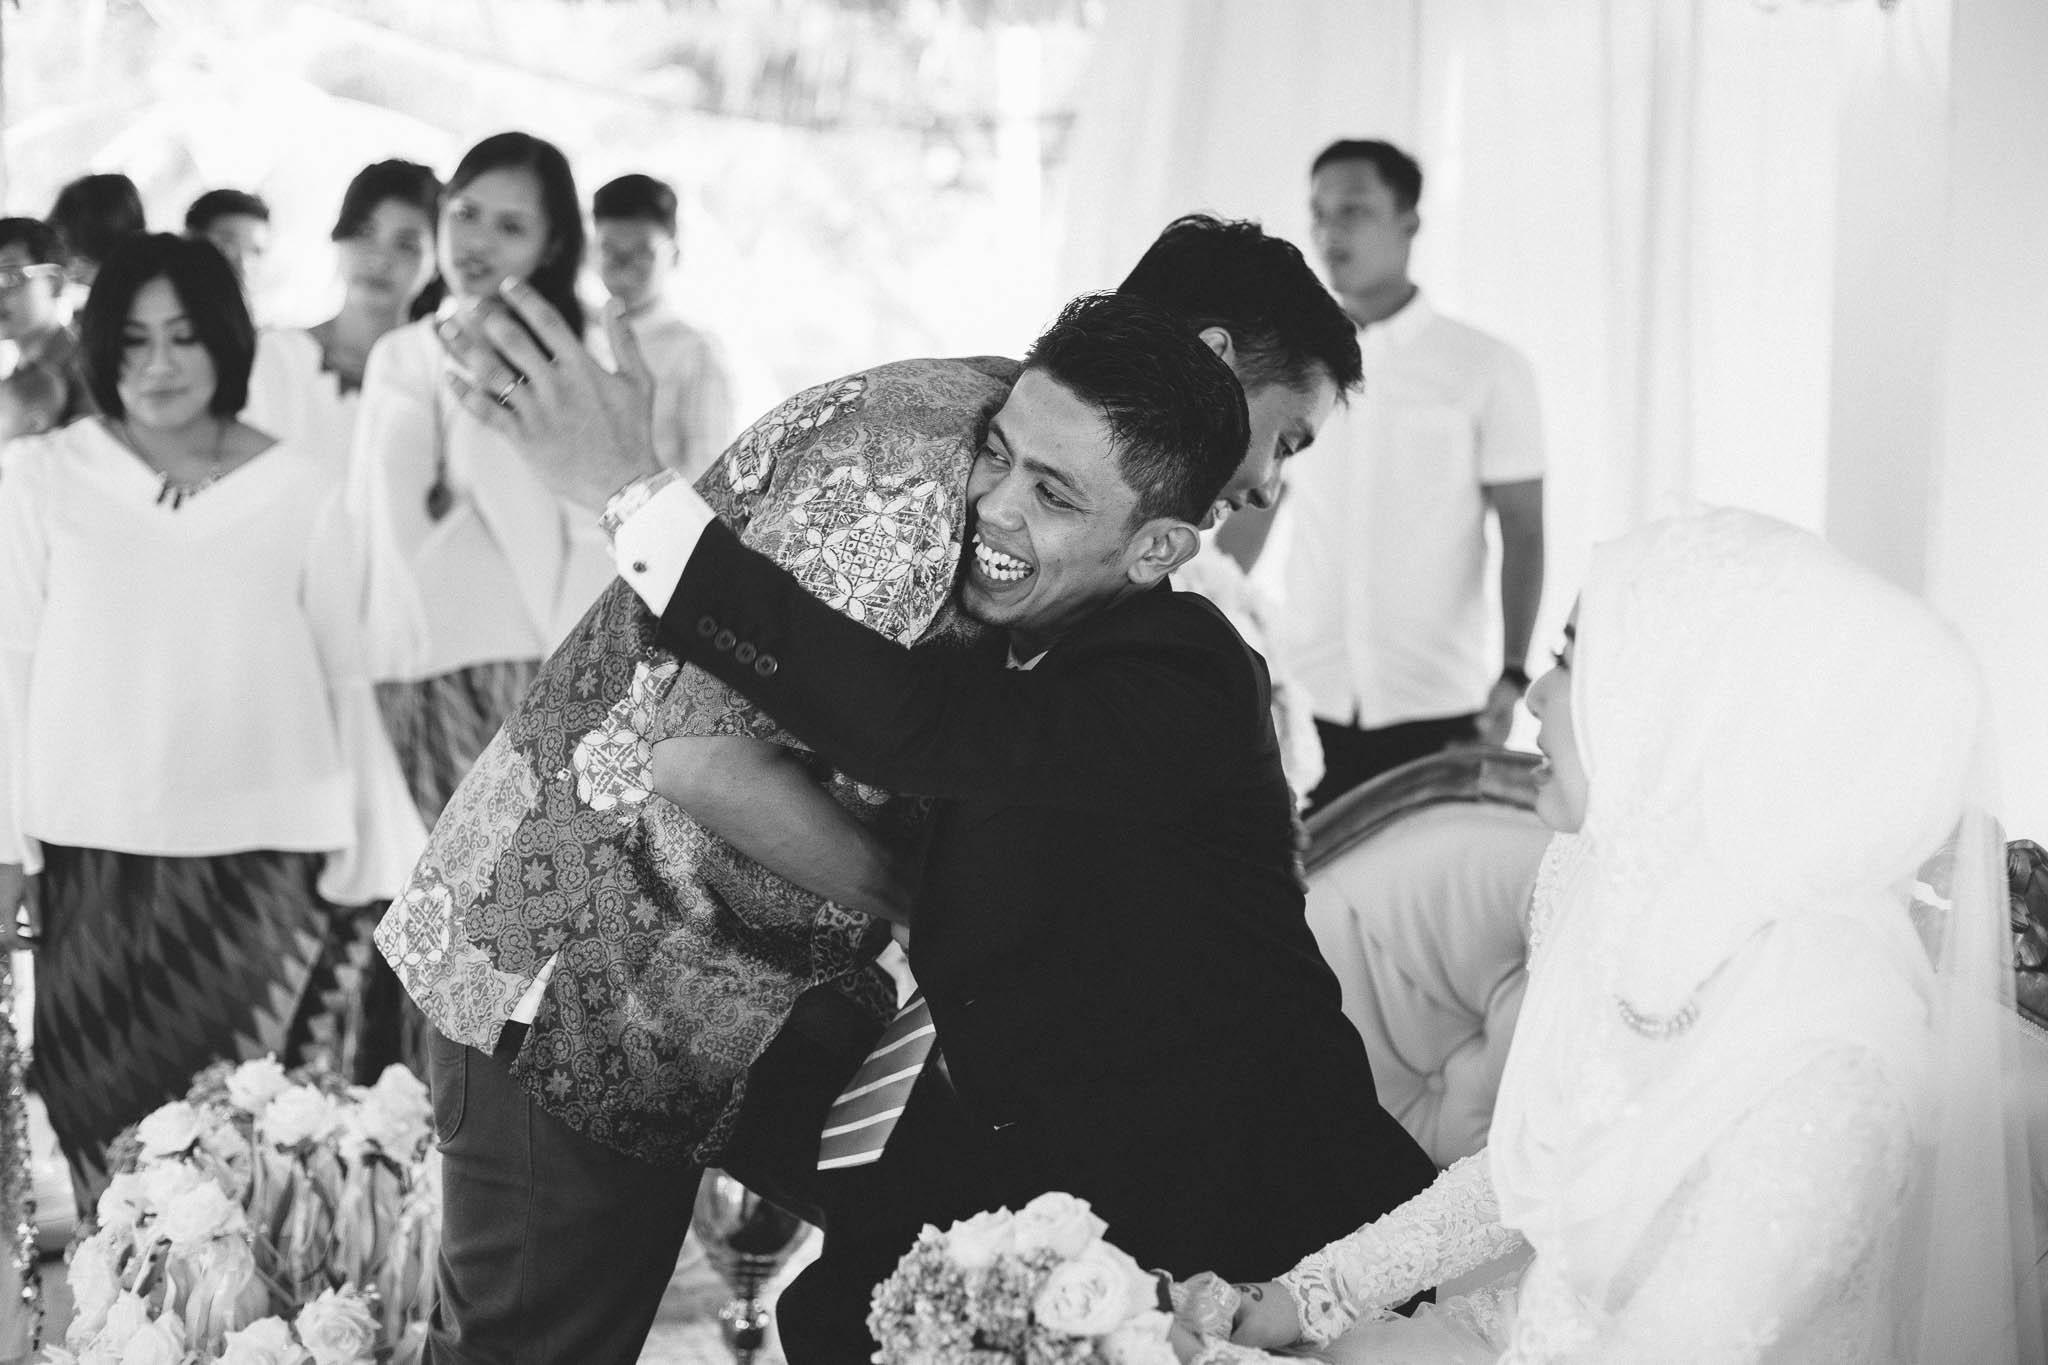 singapore-wedding-photographer-malay-indian-pre-wedding-travel-wmt-2015-61.jpg